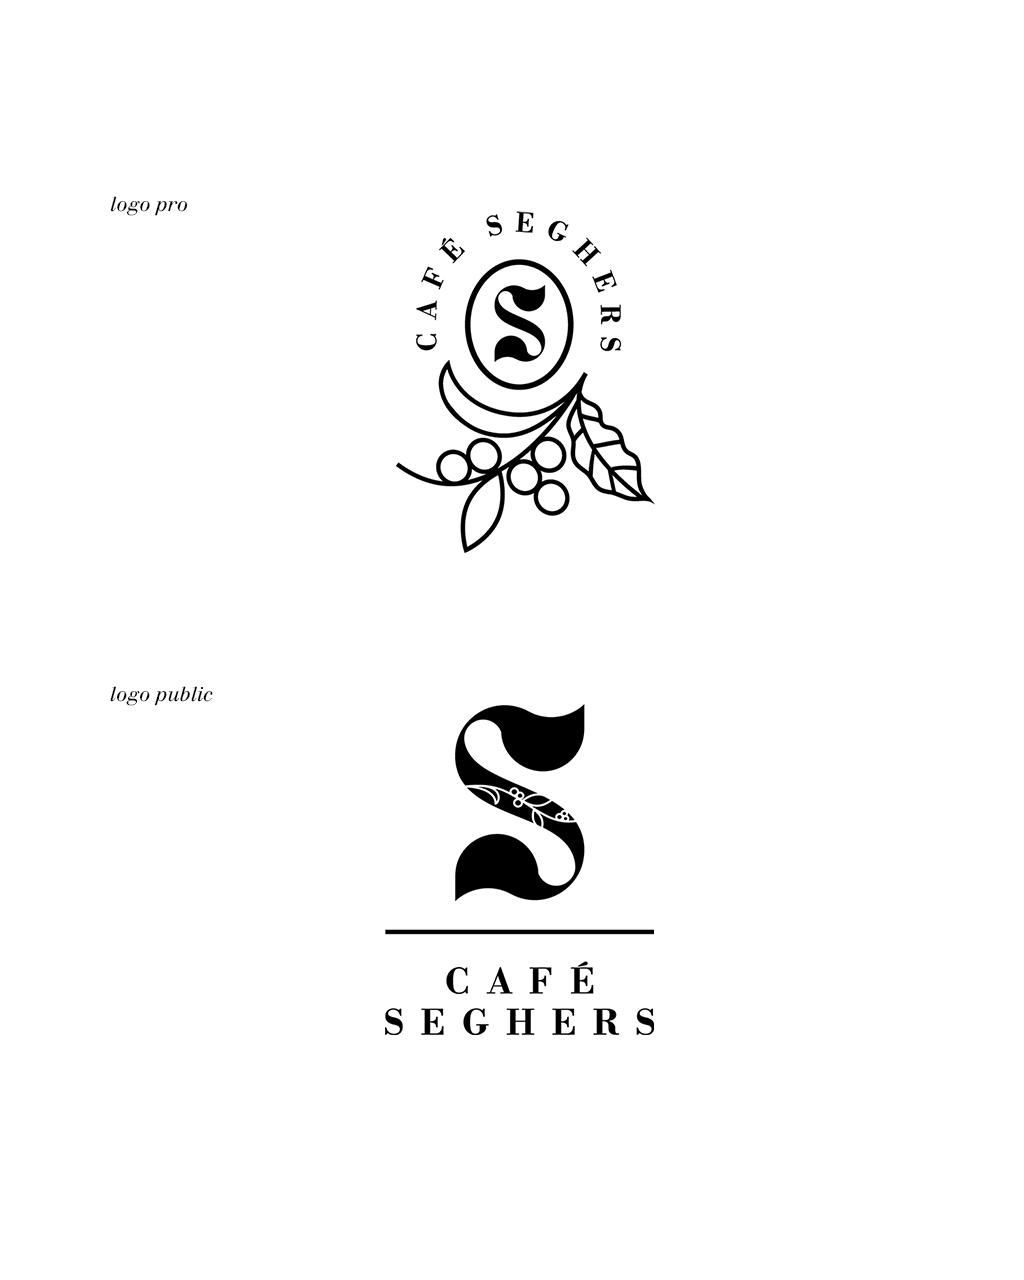 Café Seghers, Le Havre, France / coffee roaster